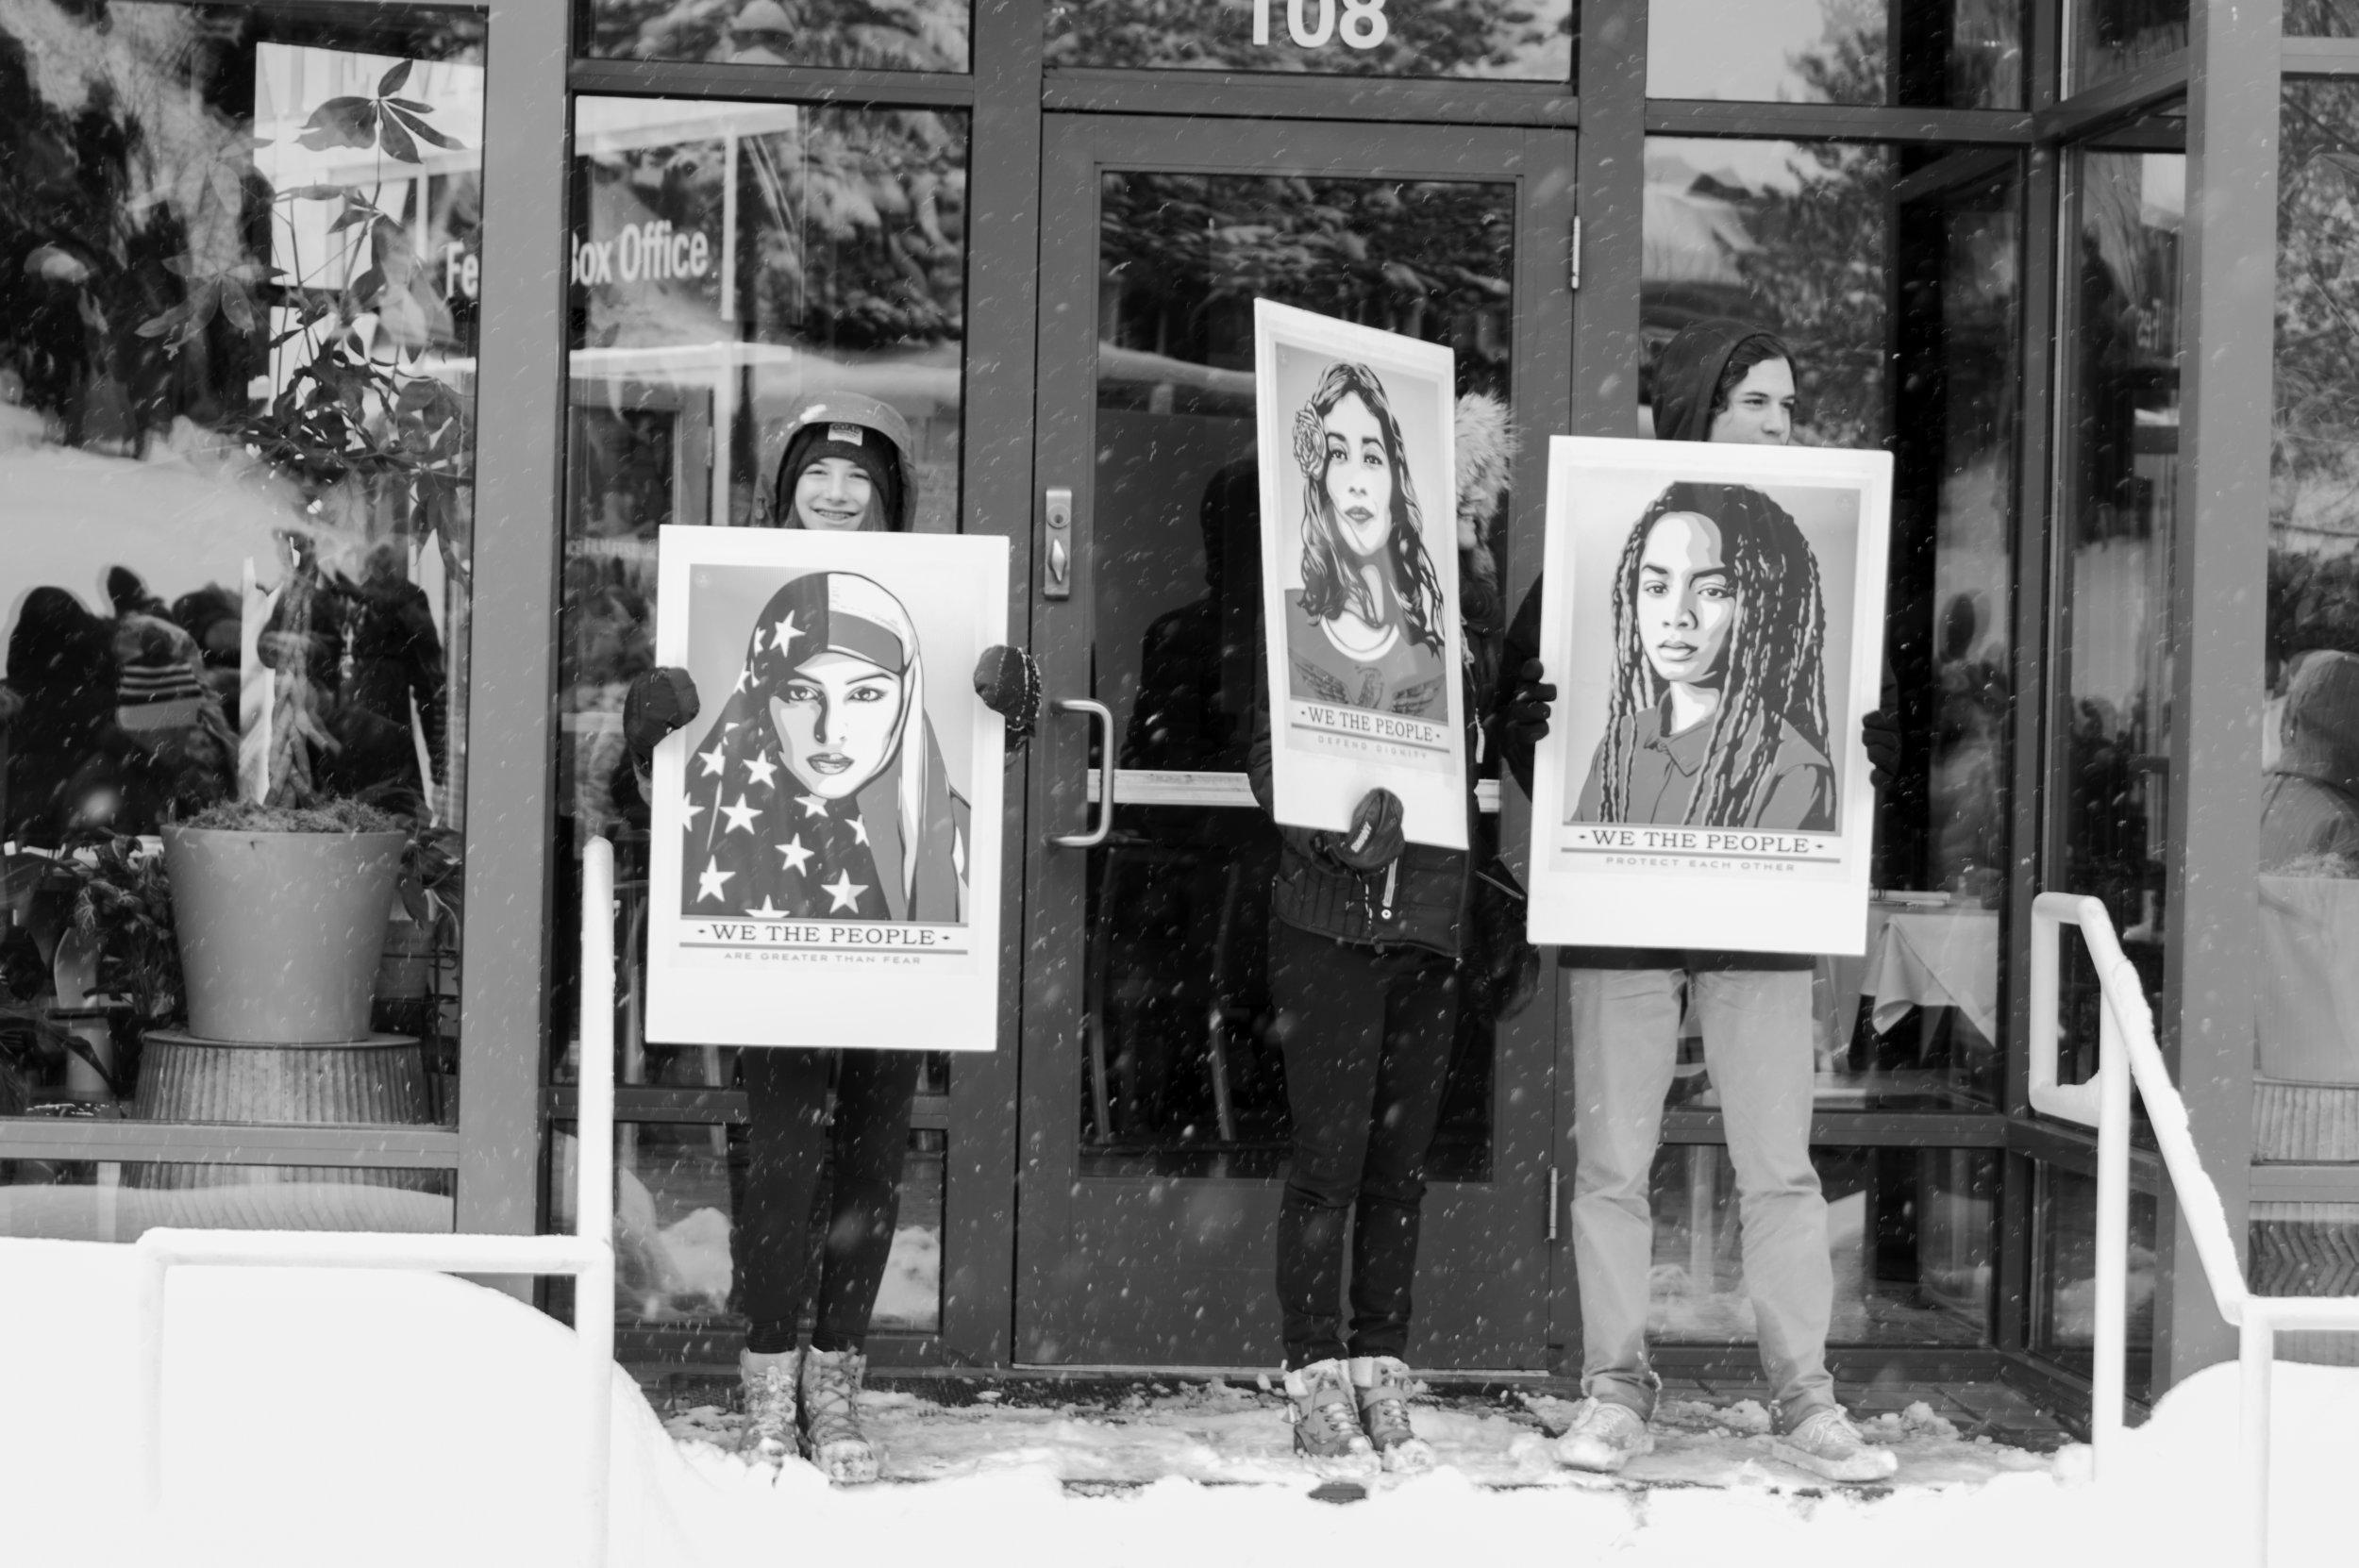 womens march_012117_gigi m kisela001.jpg